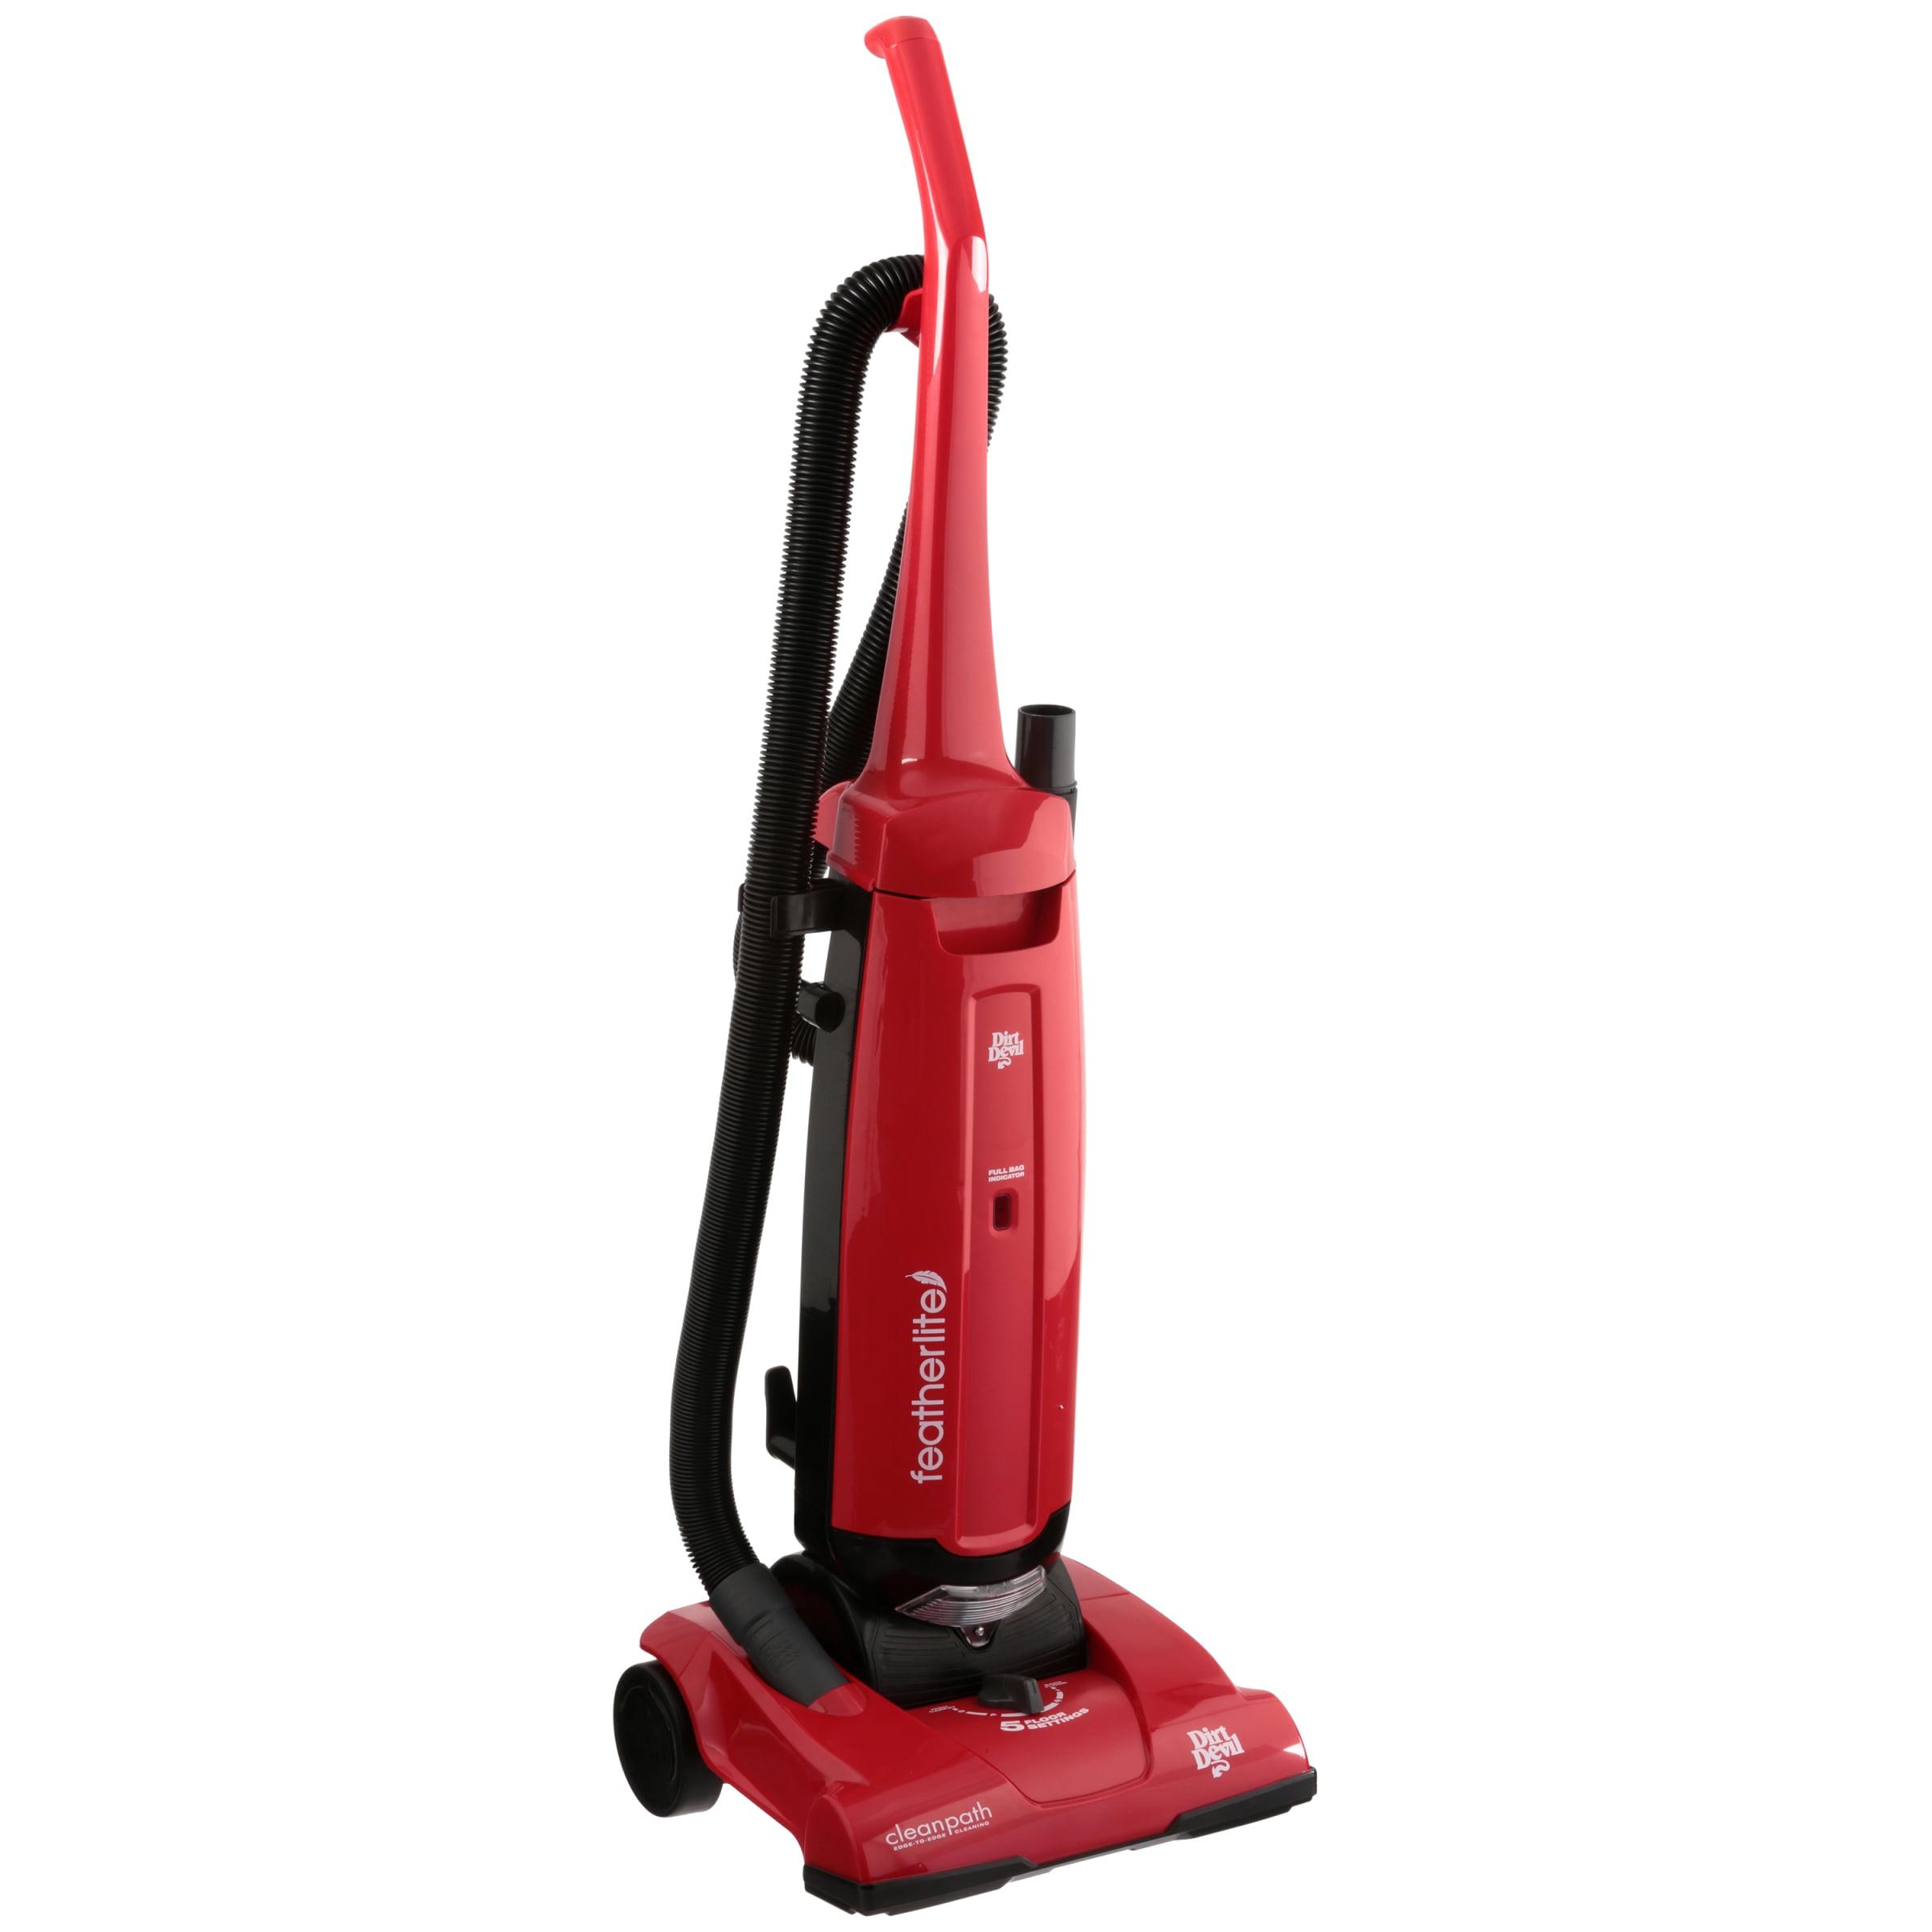 Dirt Devil® Featherlite® Bagged Upright Vacuum